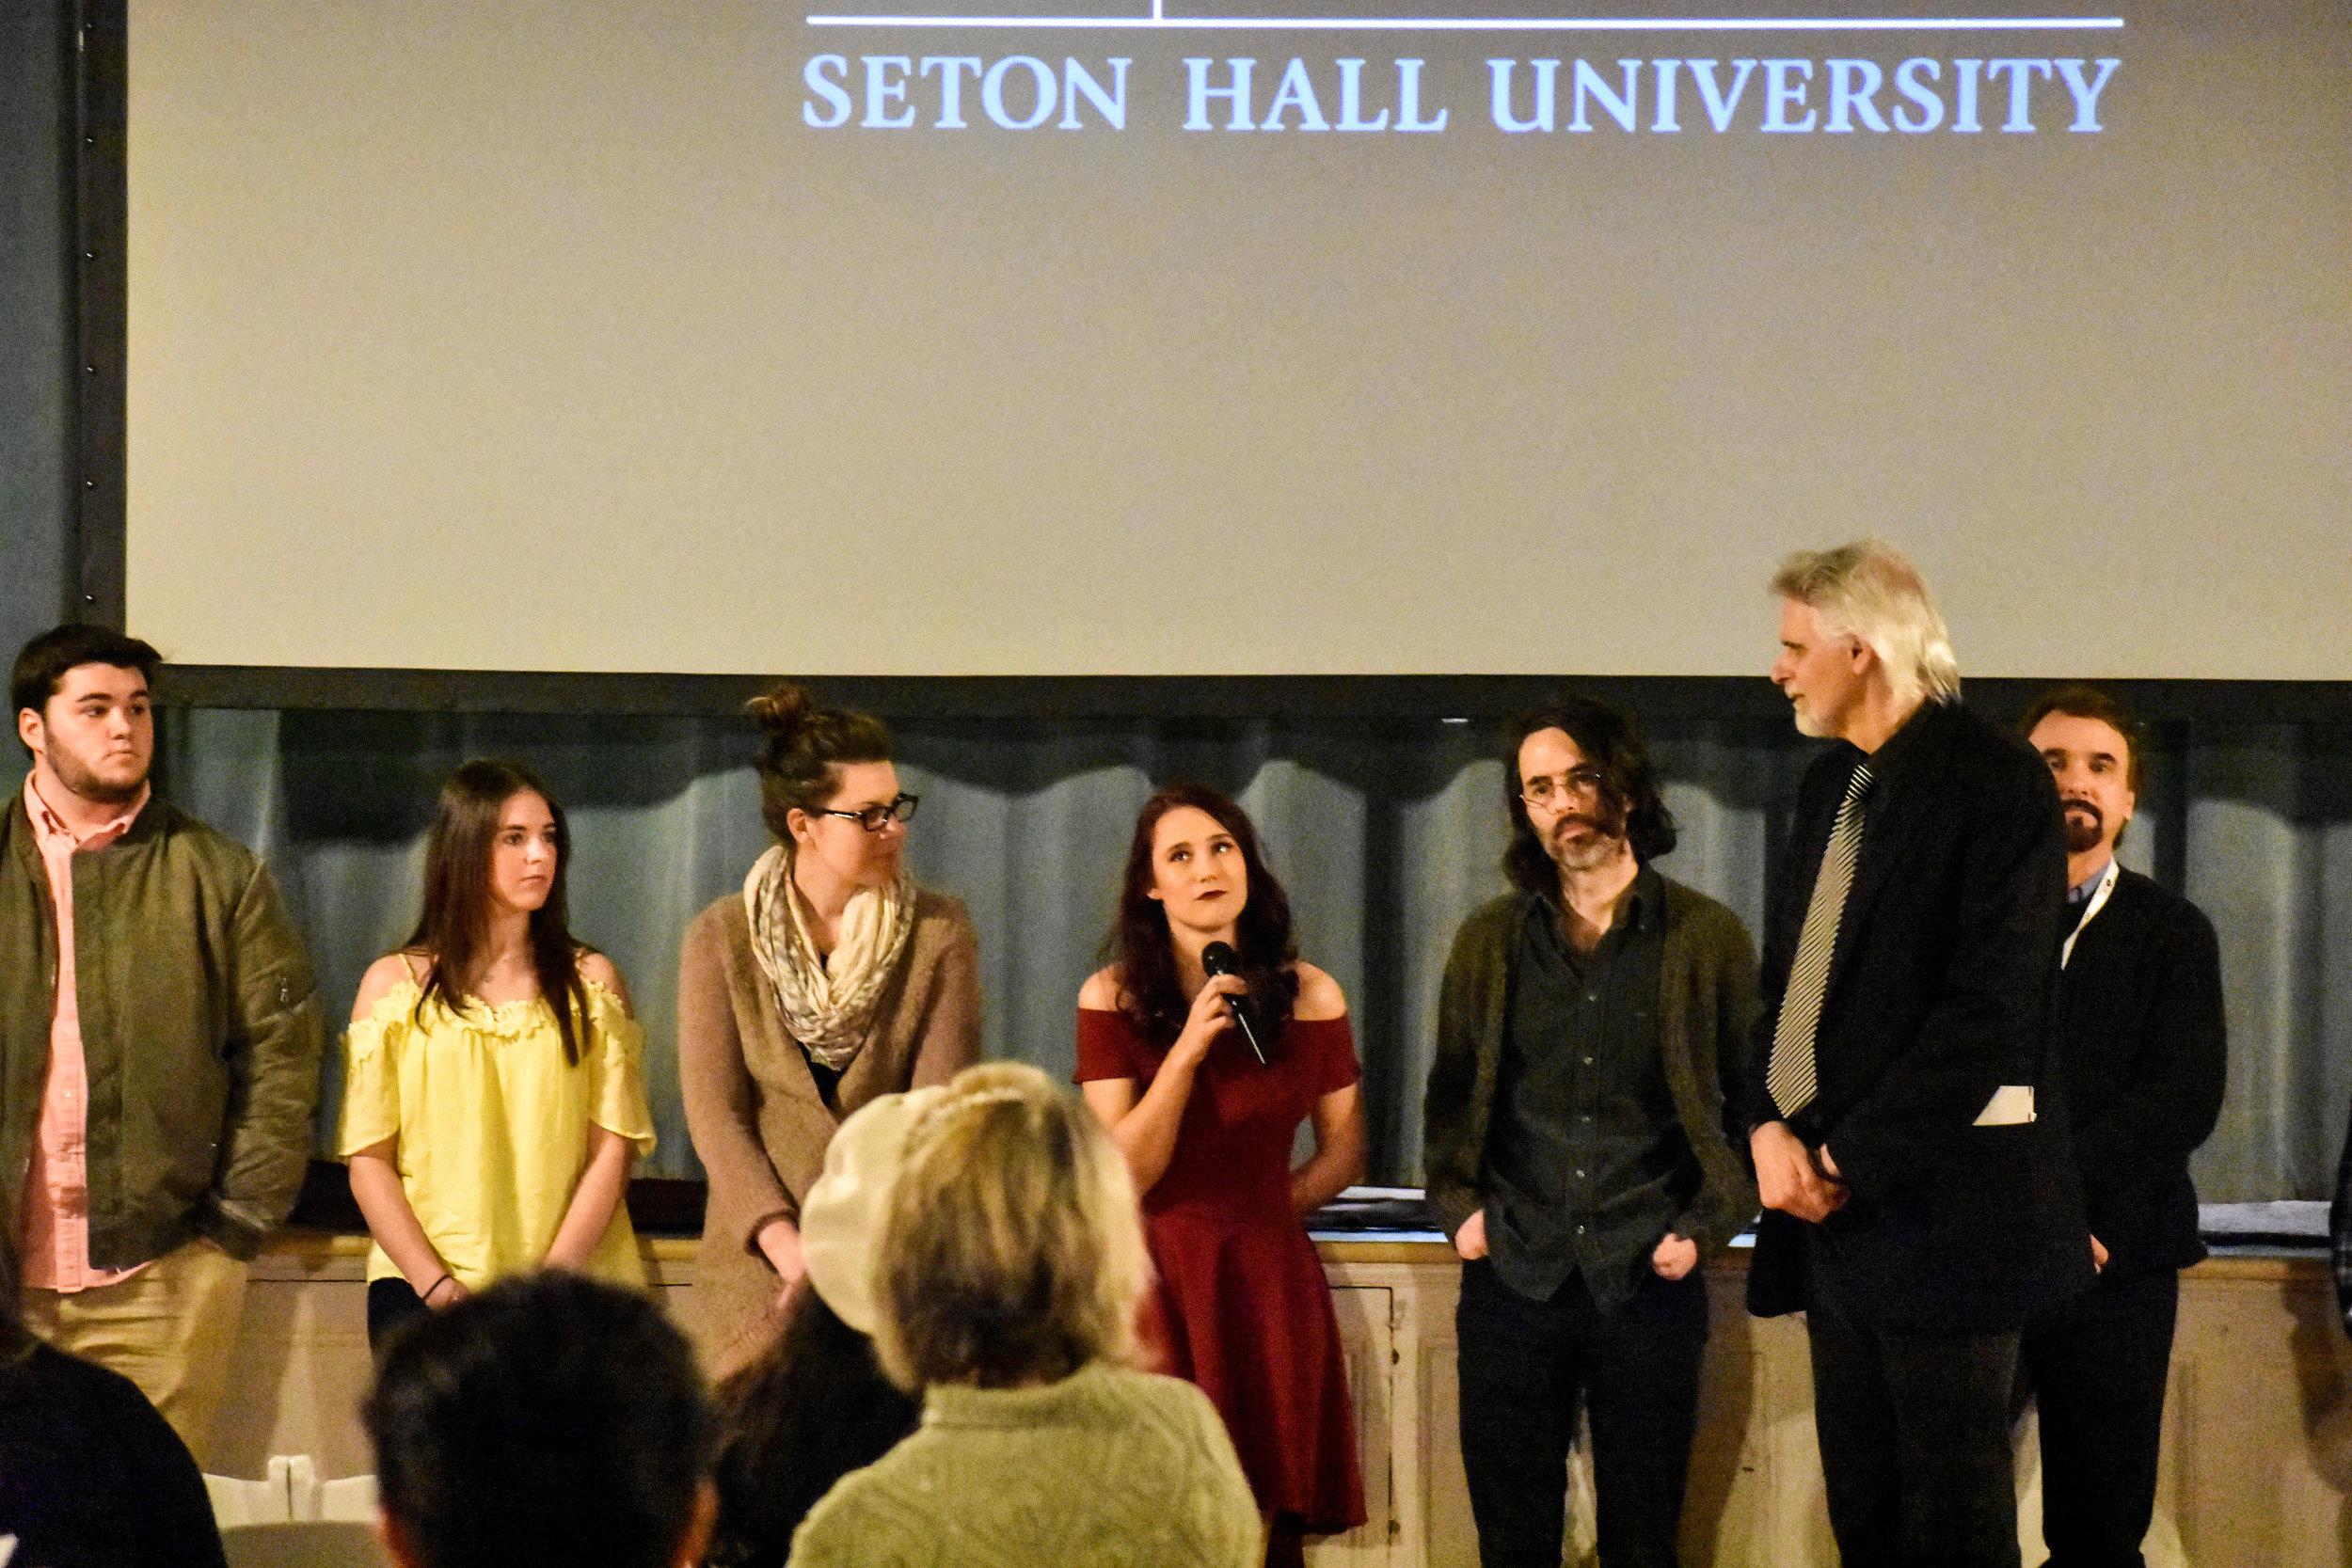 Seton Hall University Program Q&A